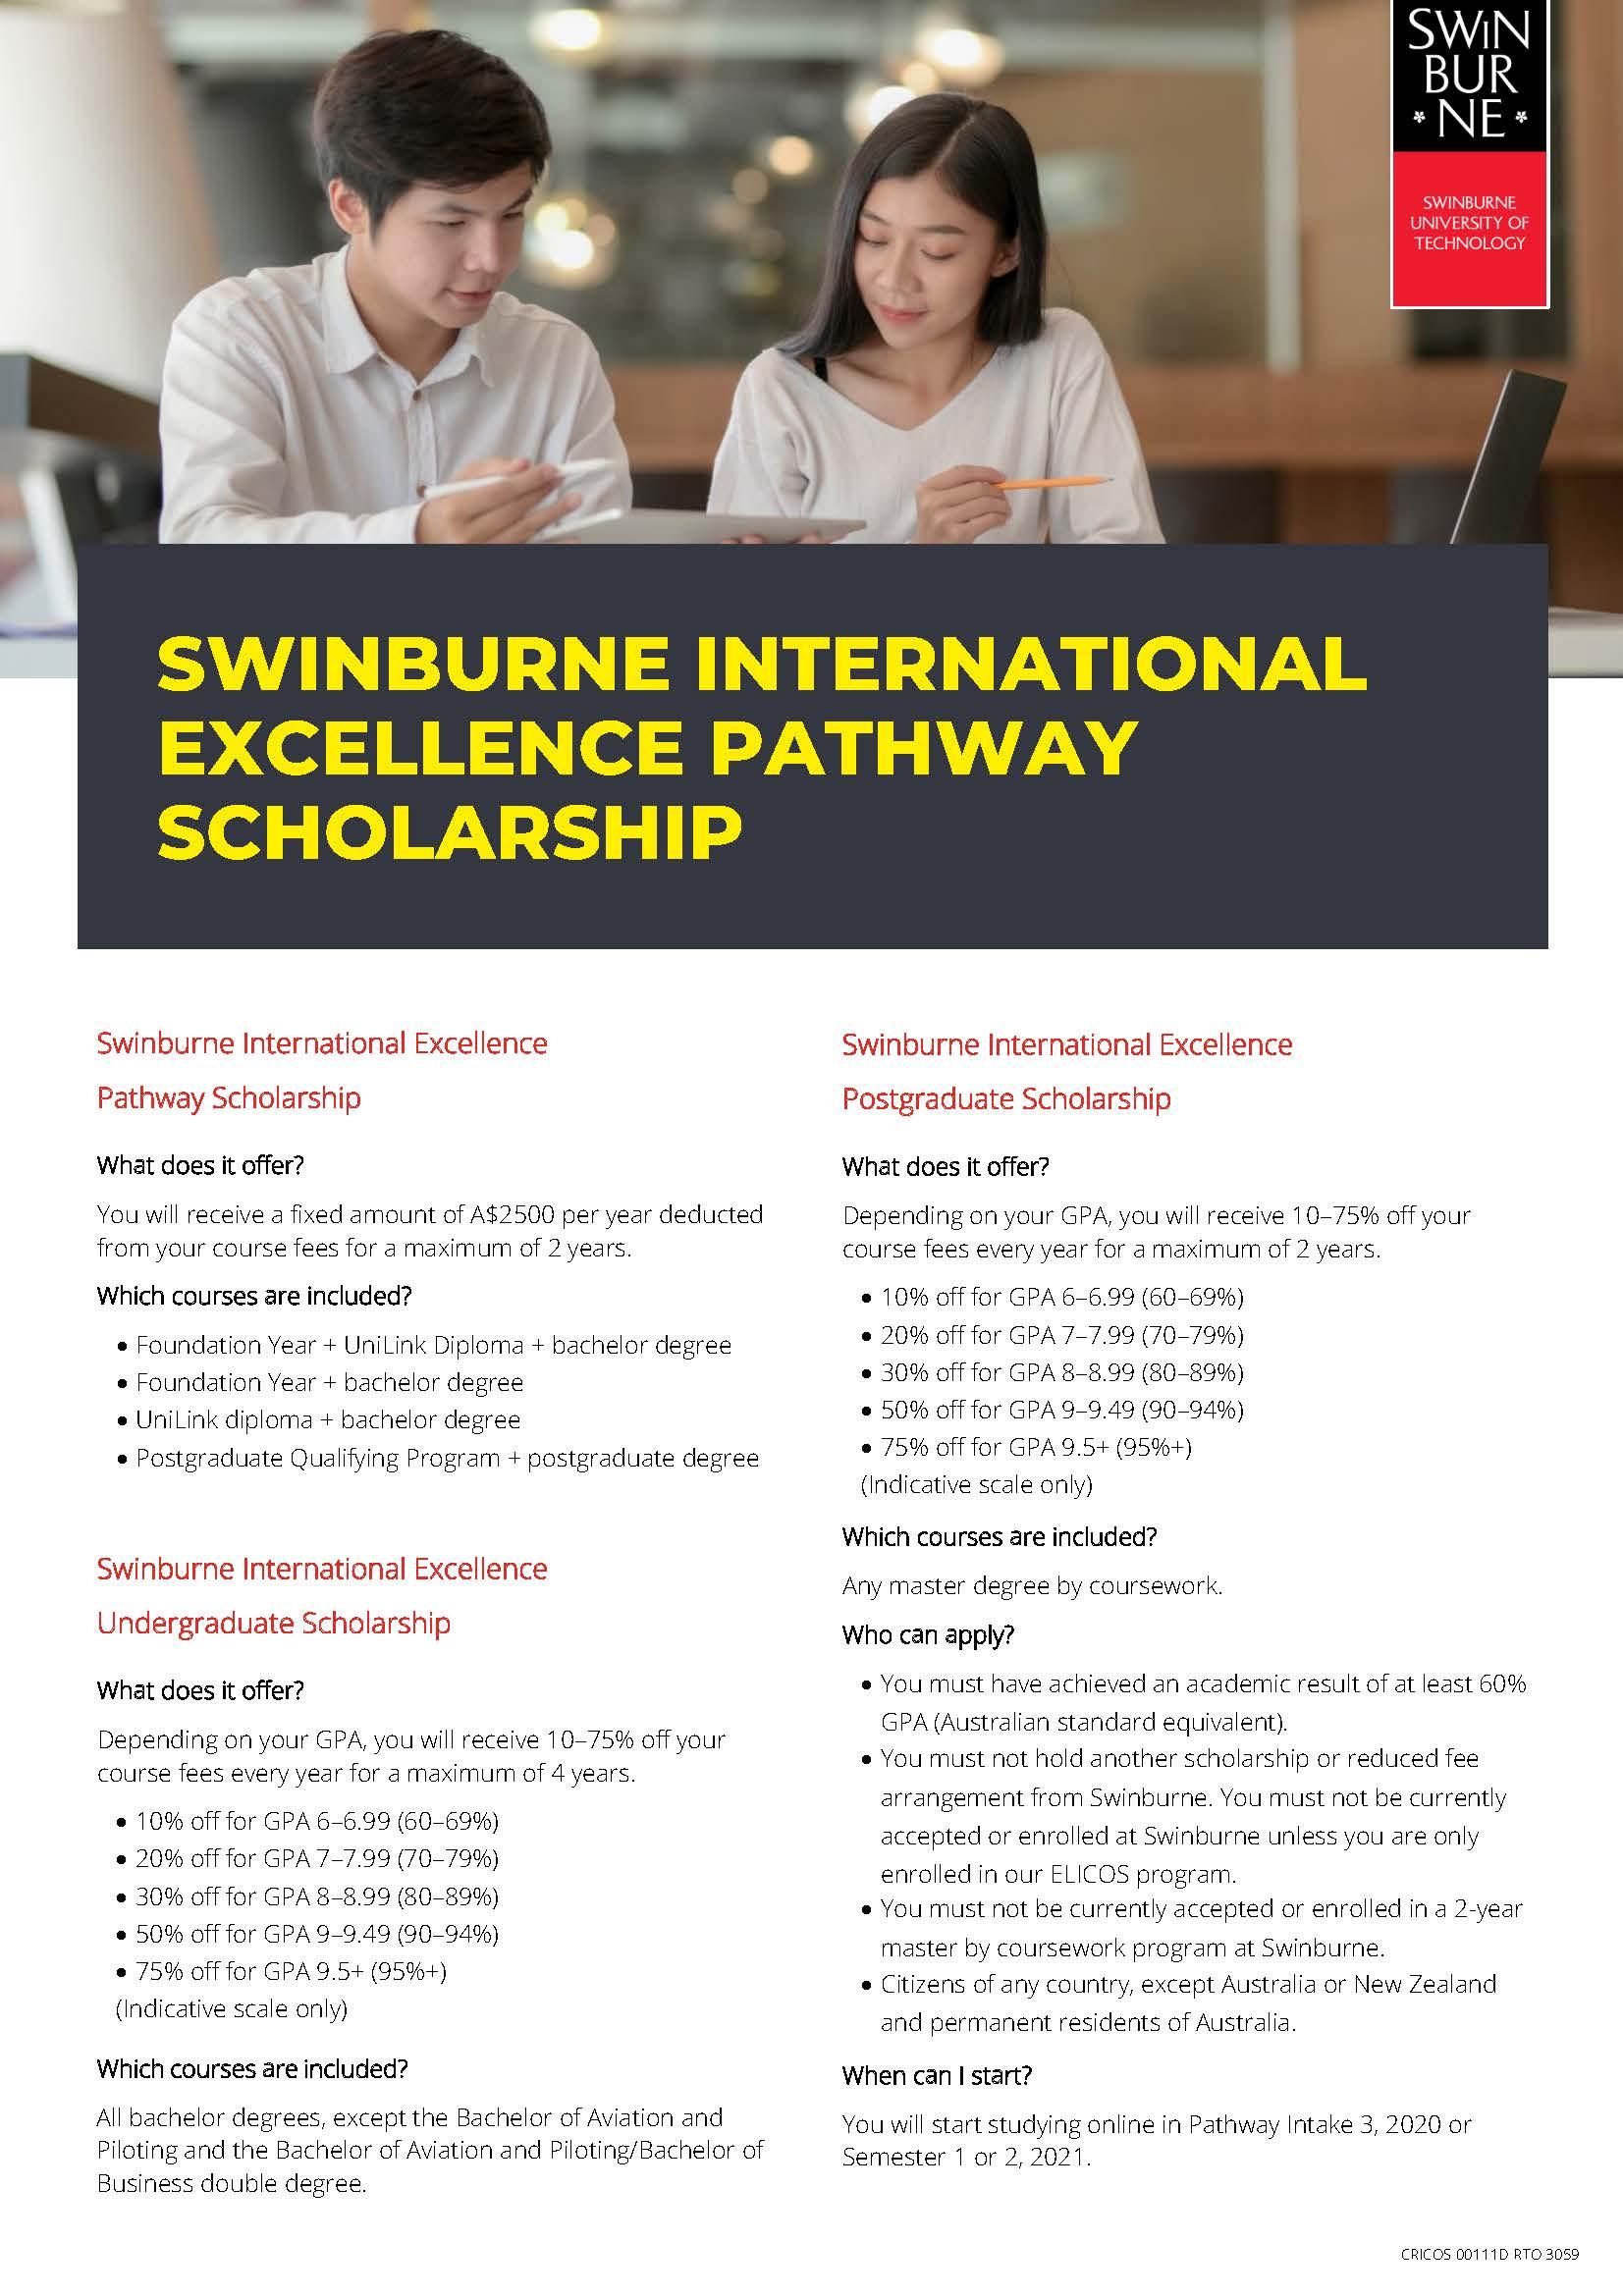 Swinburne IEP Scholarship (1)_Page_2.jpg